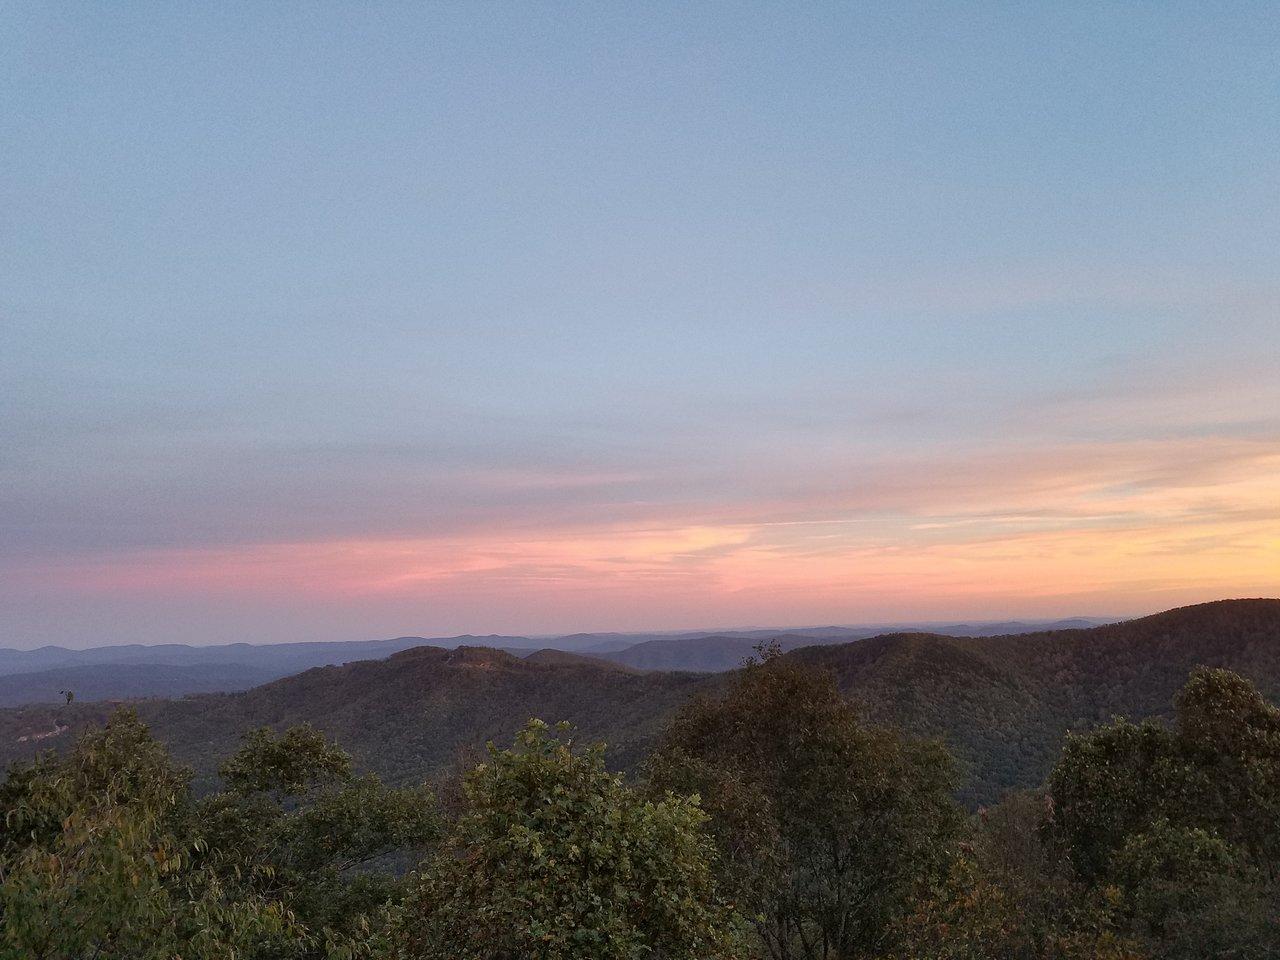 sunset-from-aol-retreat.jpg